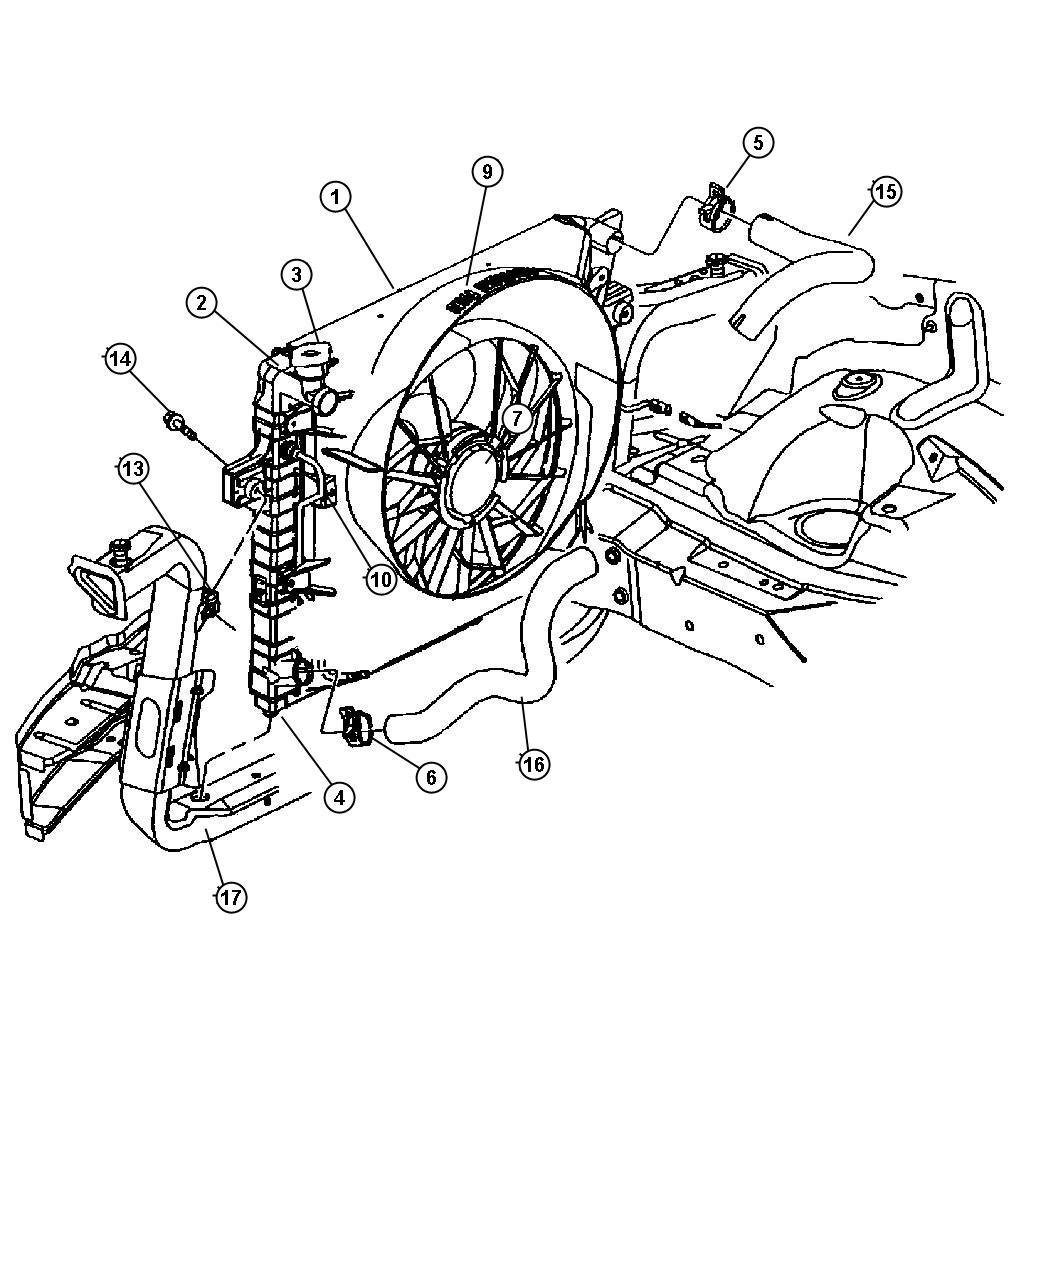 jeep grand cherokee crossmember  radiator  front lower